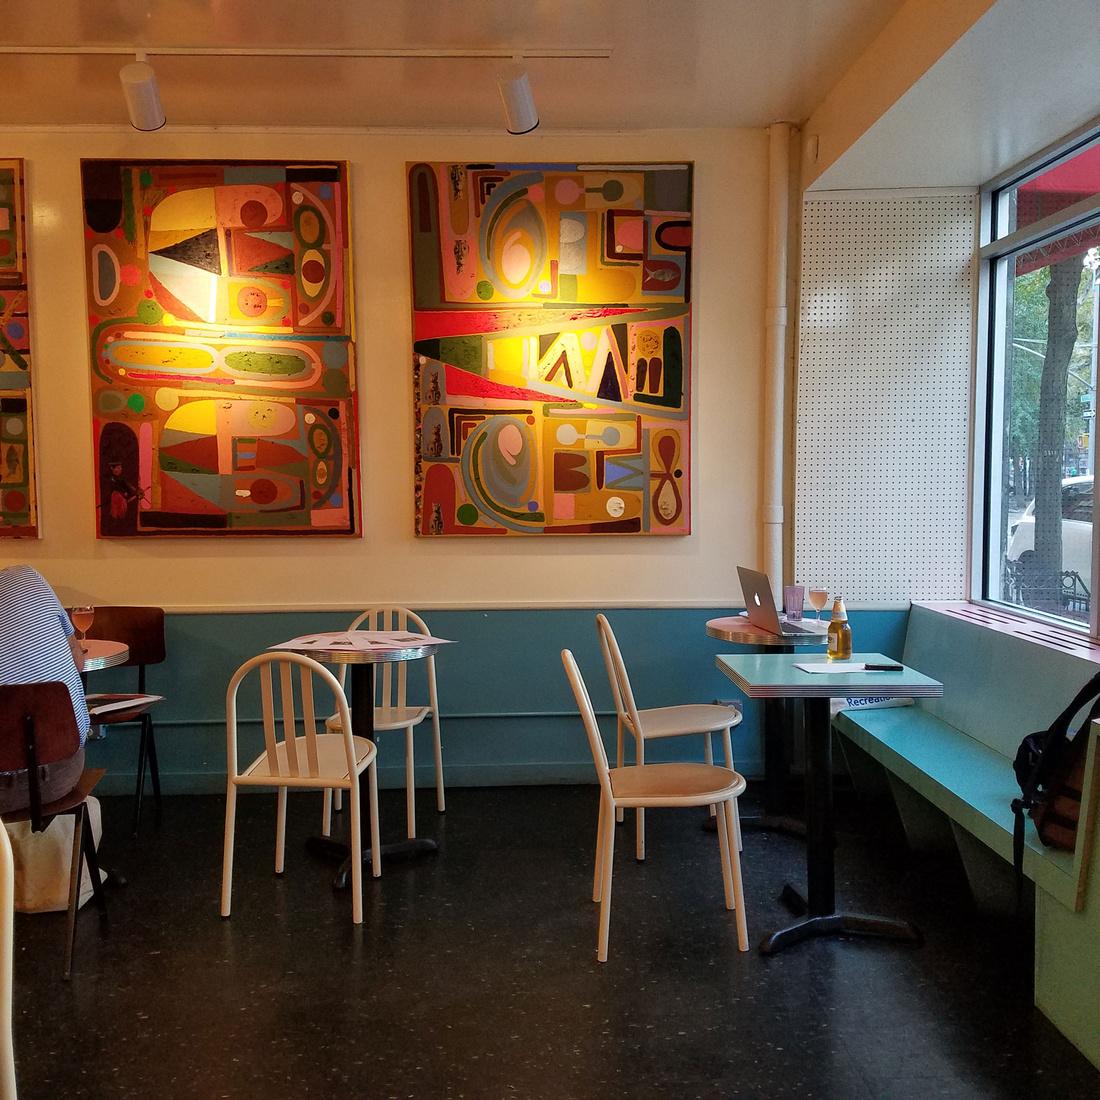 Installation shot of Eddy's work in Café Henrie.